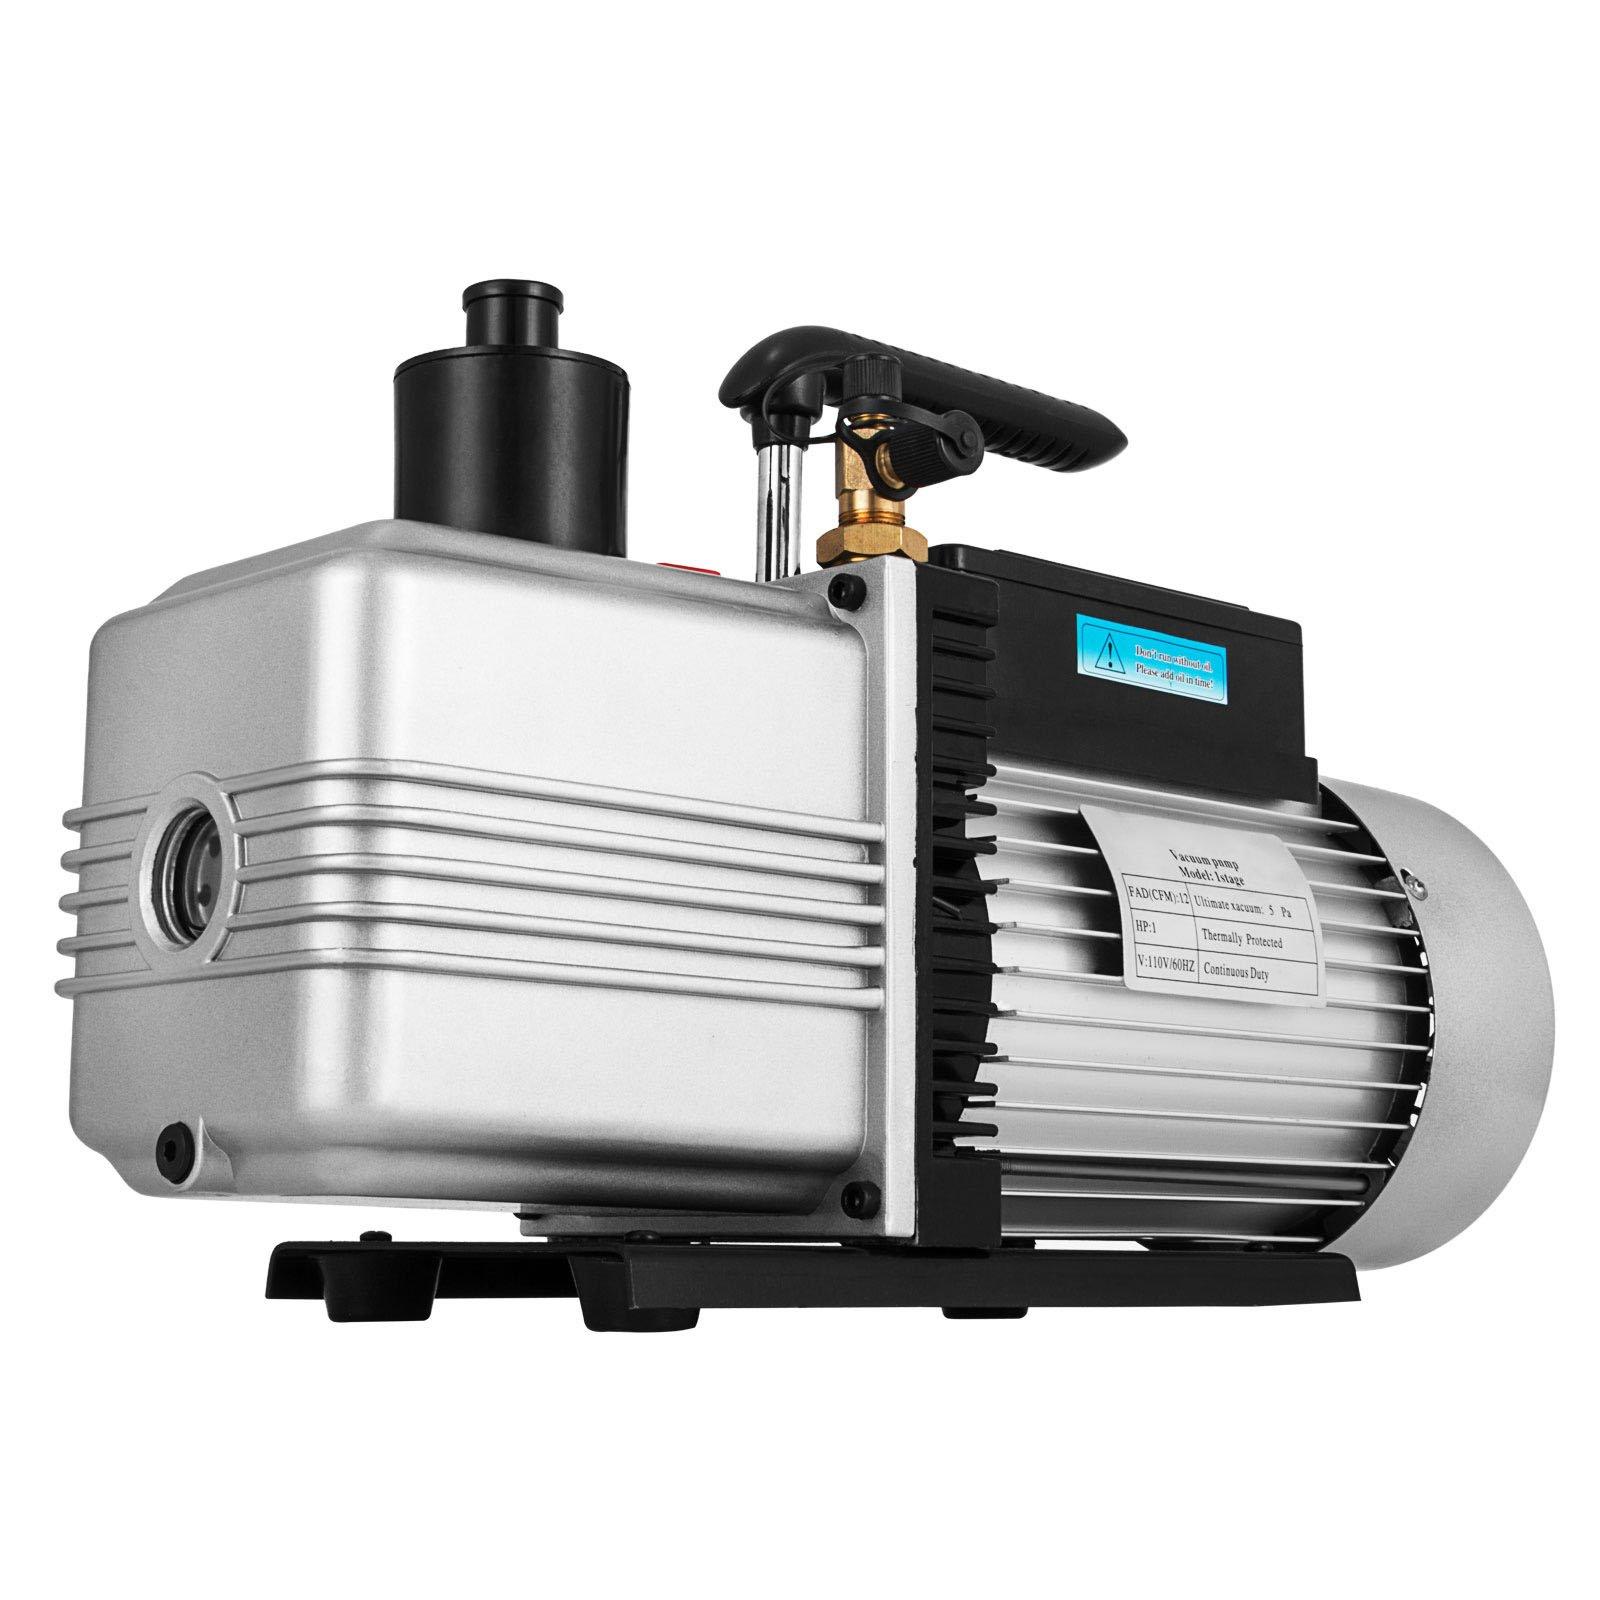 LOVSHARE 12CFM 1HP Vacuum Pump 110V 2 Meter Valve 1 Stage 5PA Ultimate Air Conditioning Refrigerant Vacuum Pump for HVAC/Auto AC Refrigerant Recharging Degassing wine epoxy Milking cow lamb Medical